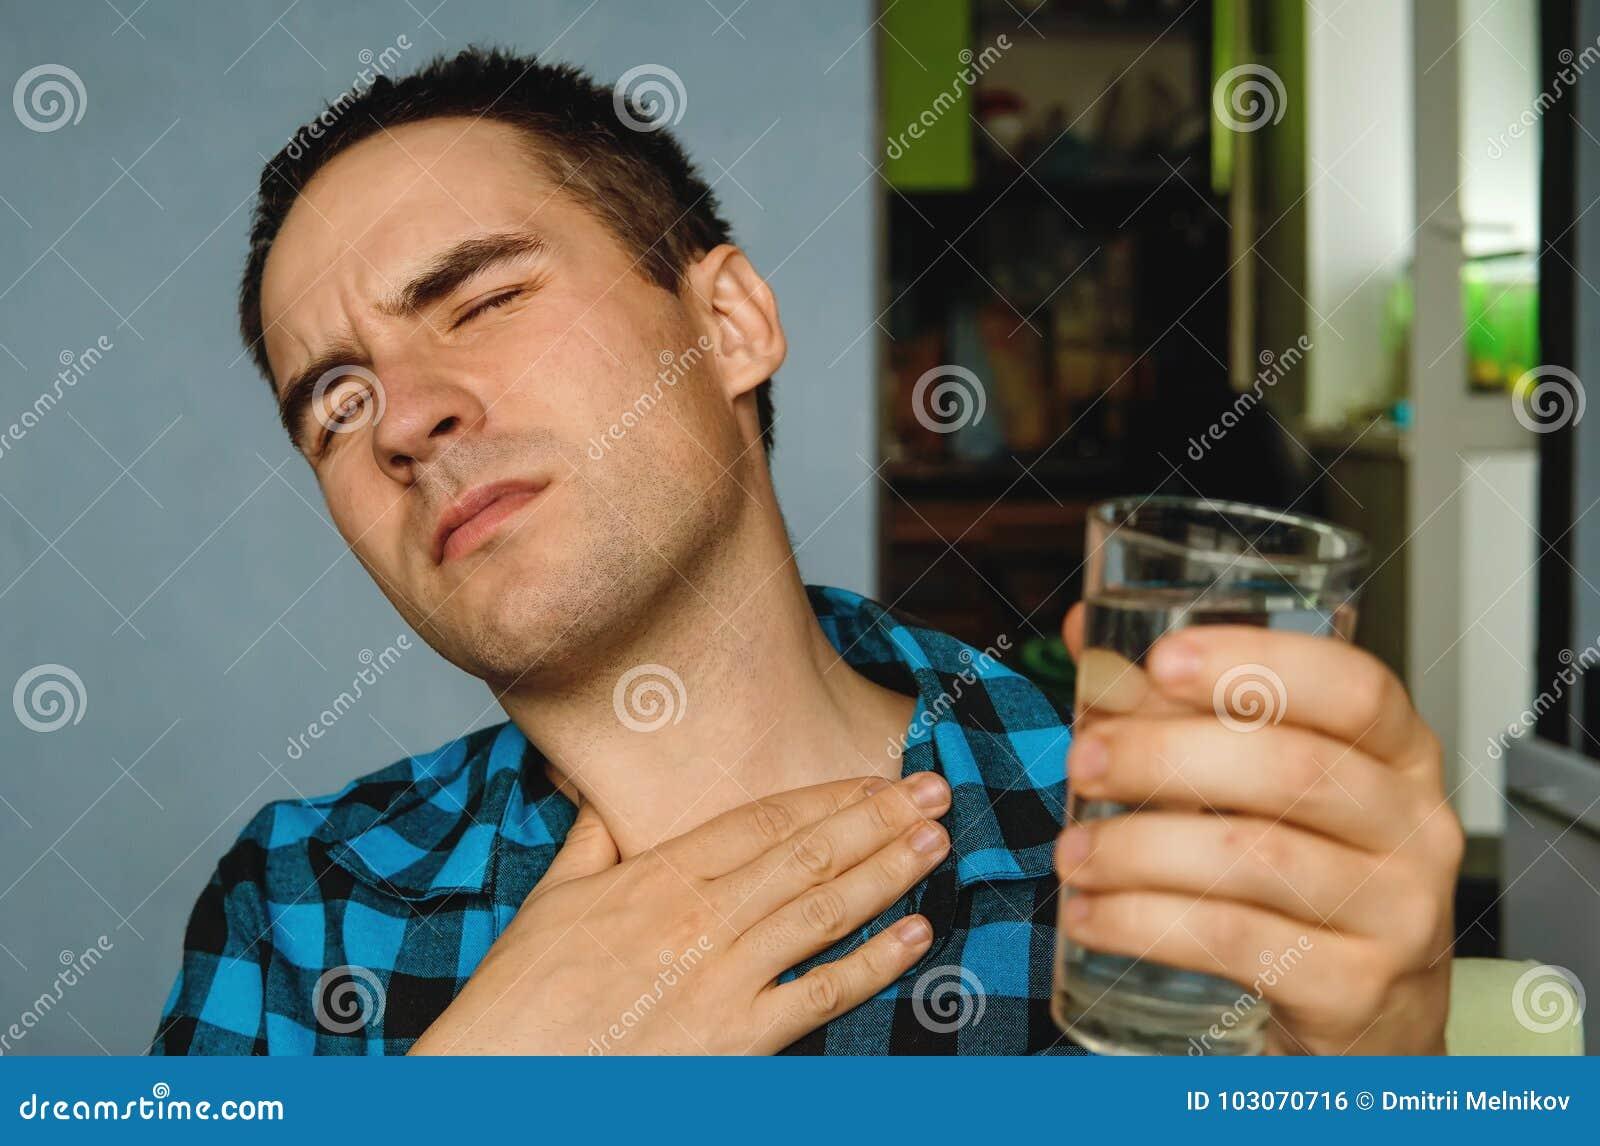 Pain and sore throat